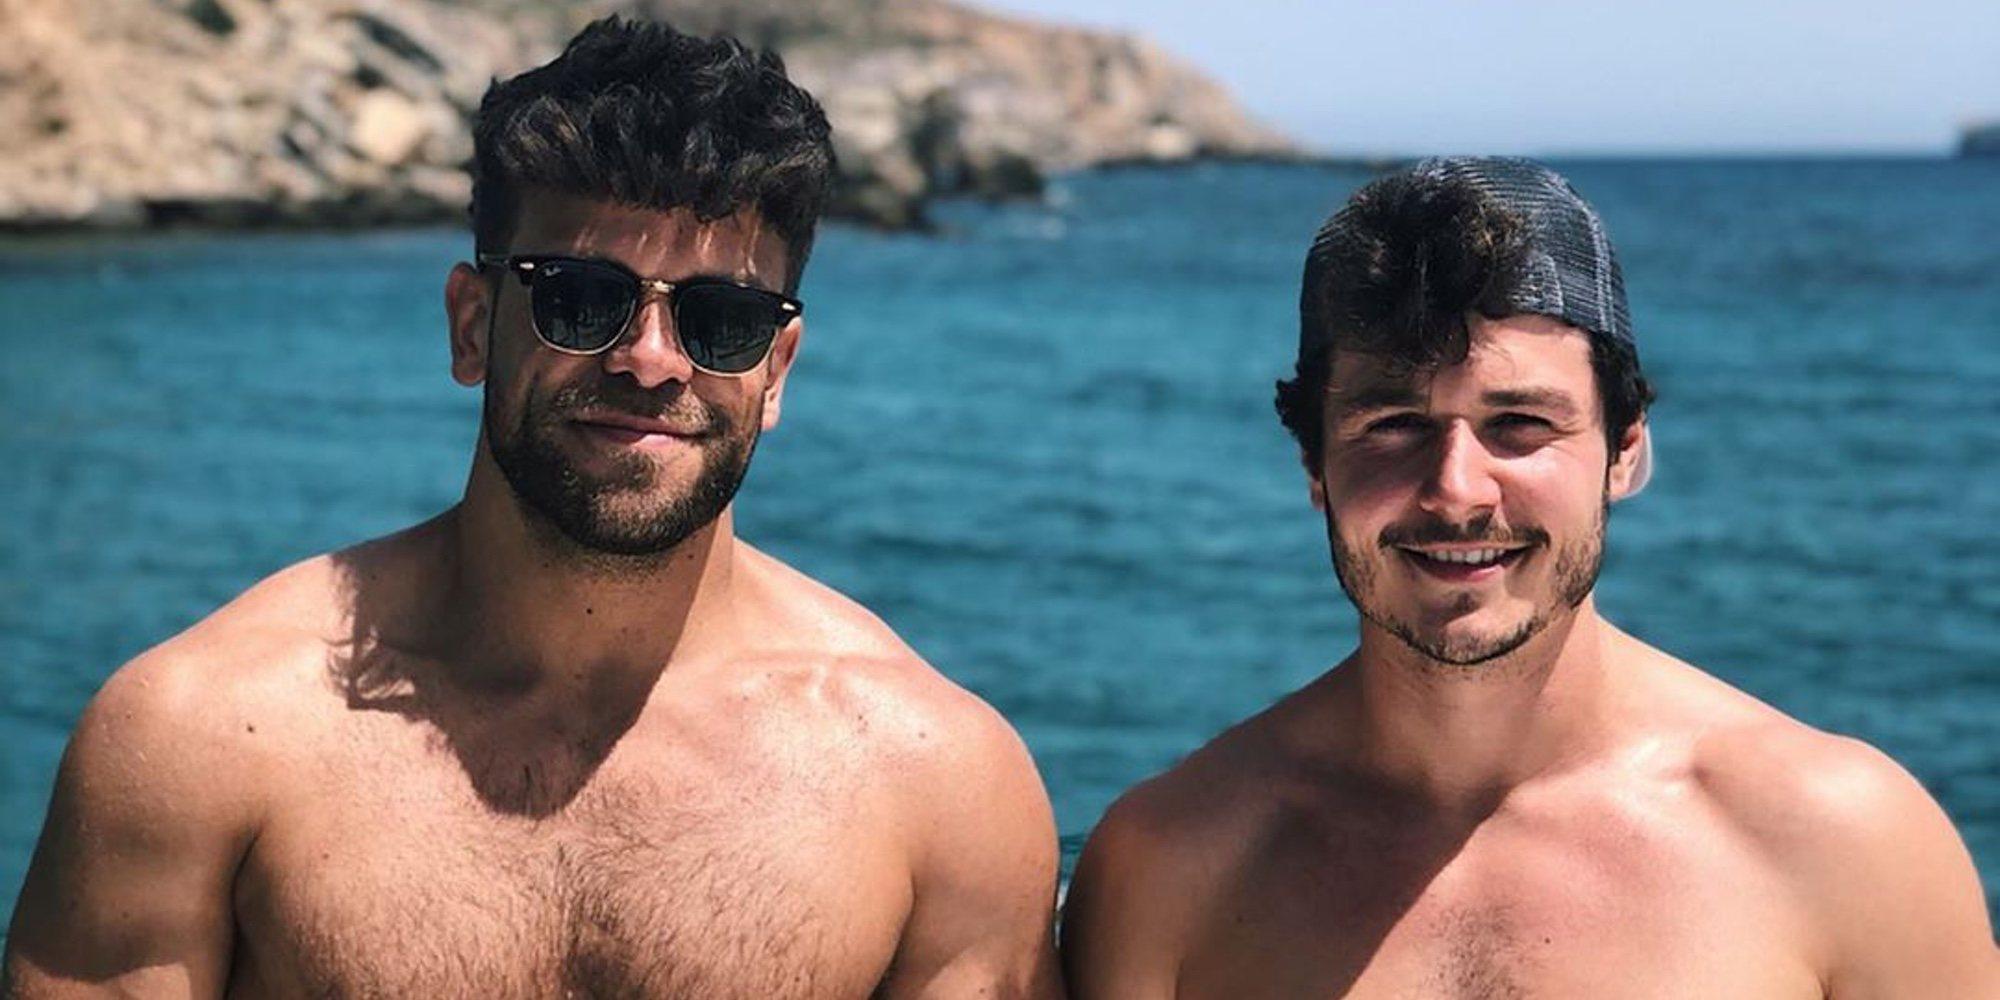 Raoul Vázquez presume de cuerpazo emulando a Ricky Merino y Miki Núñez